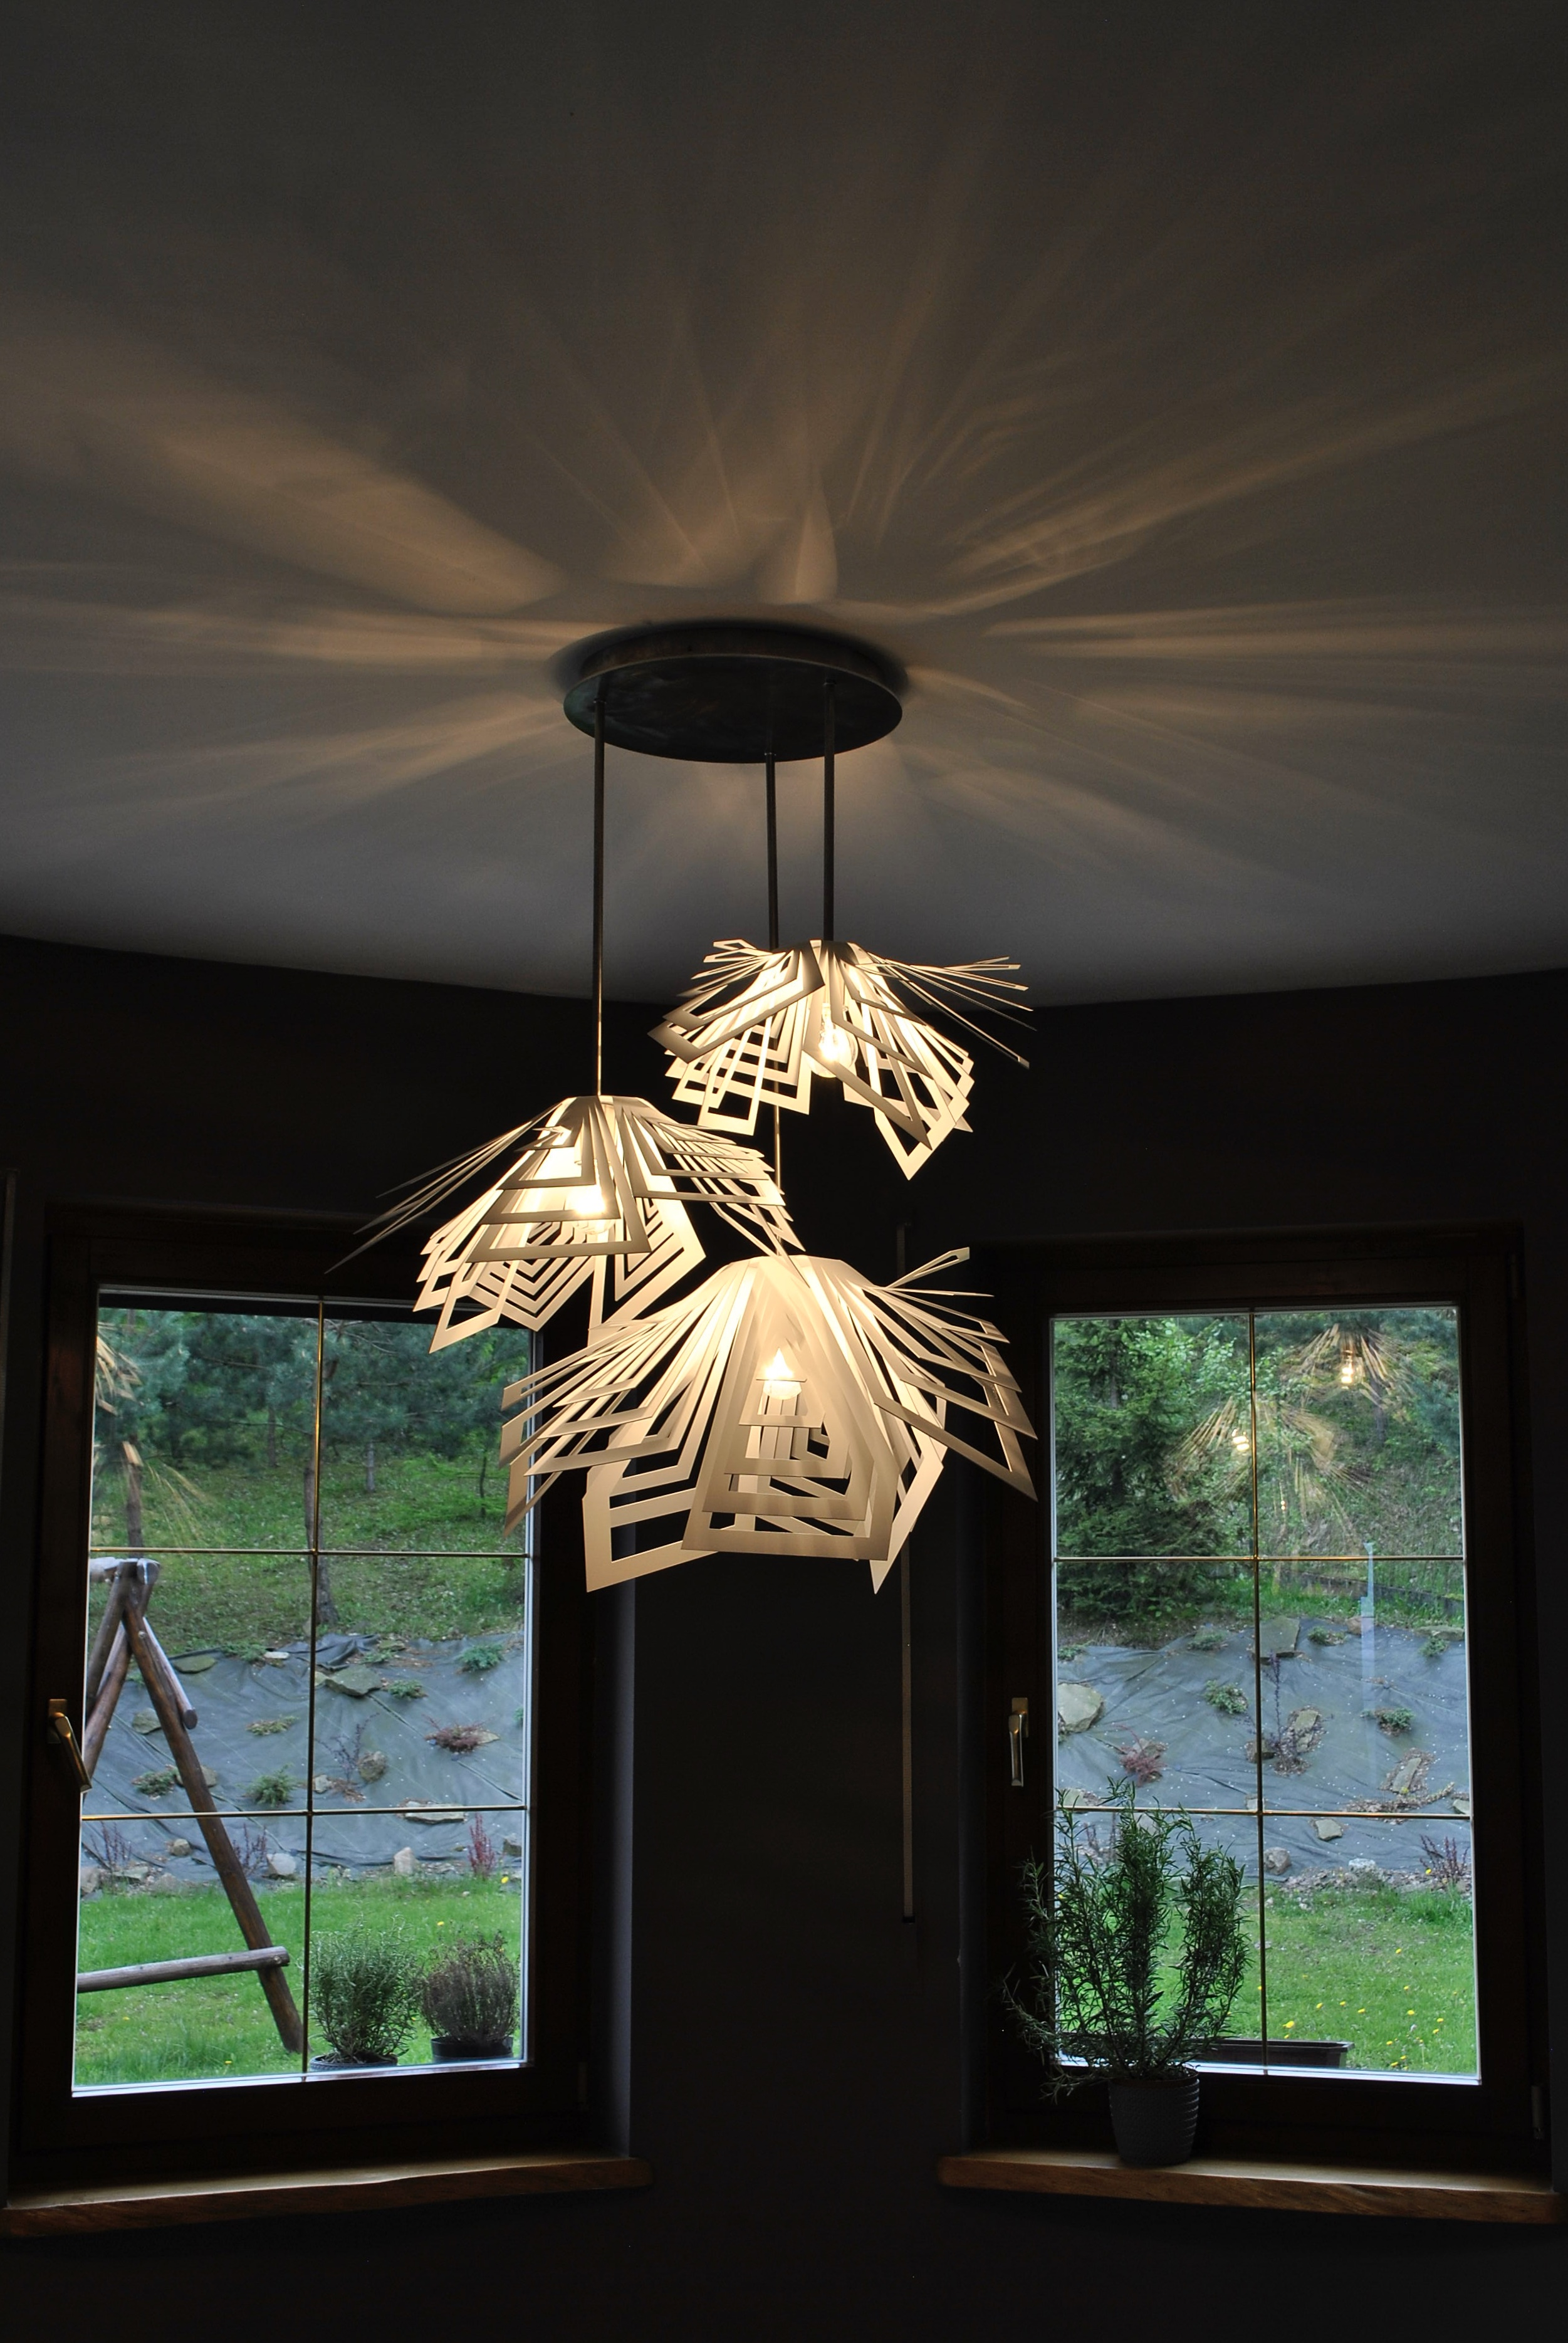 photo furniture poulsen louis lighting p lookalike decor home ceiling on light